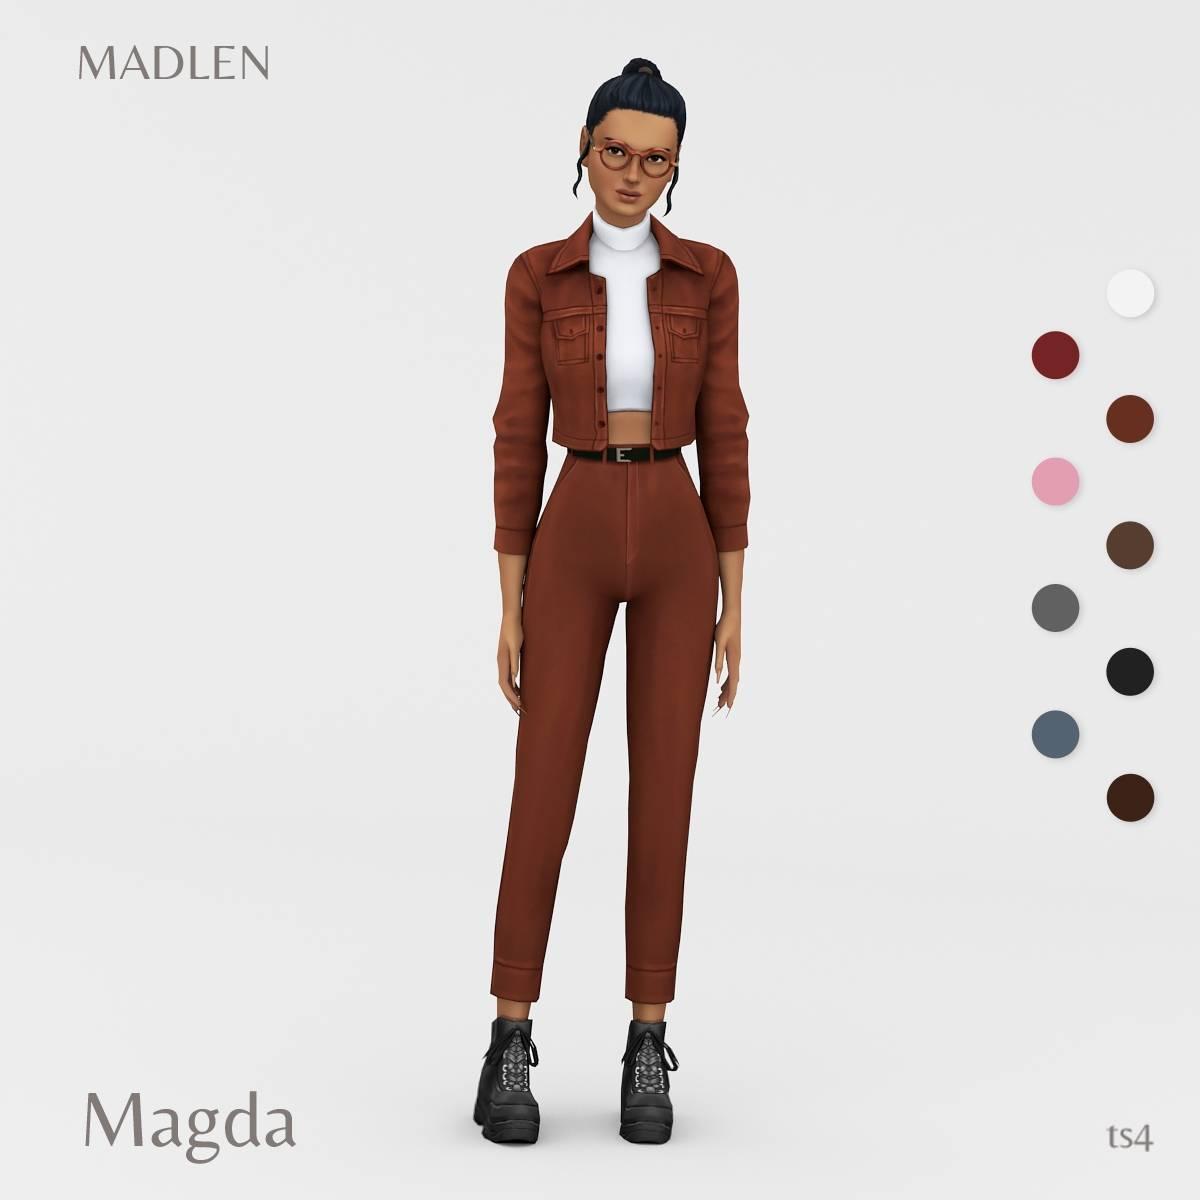 Женский костюм - Magda Outfit